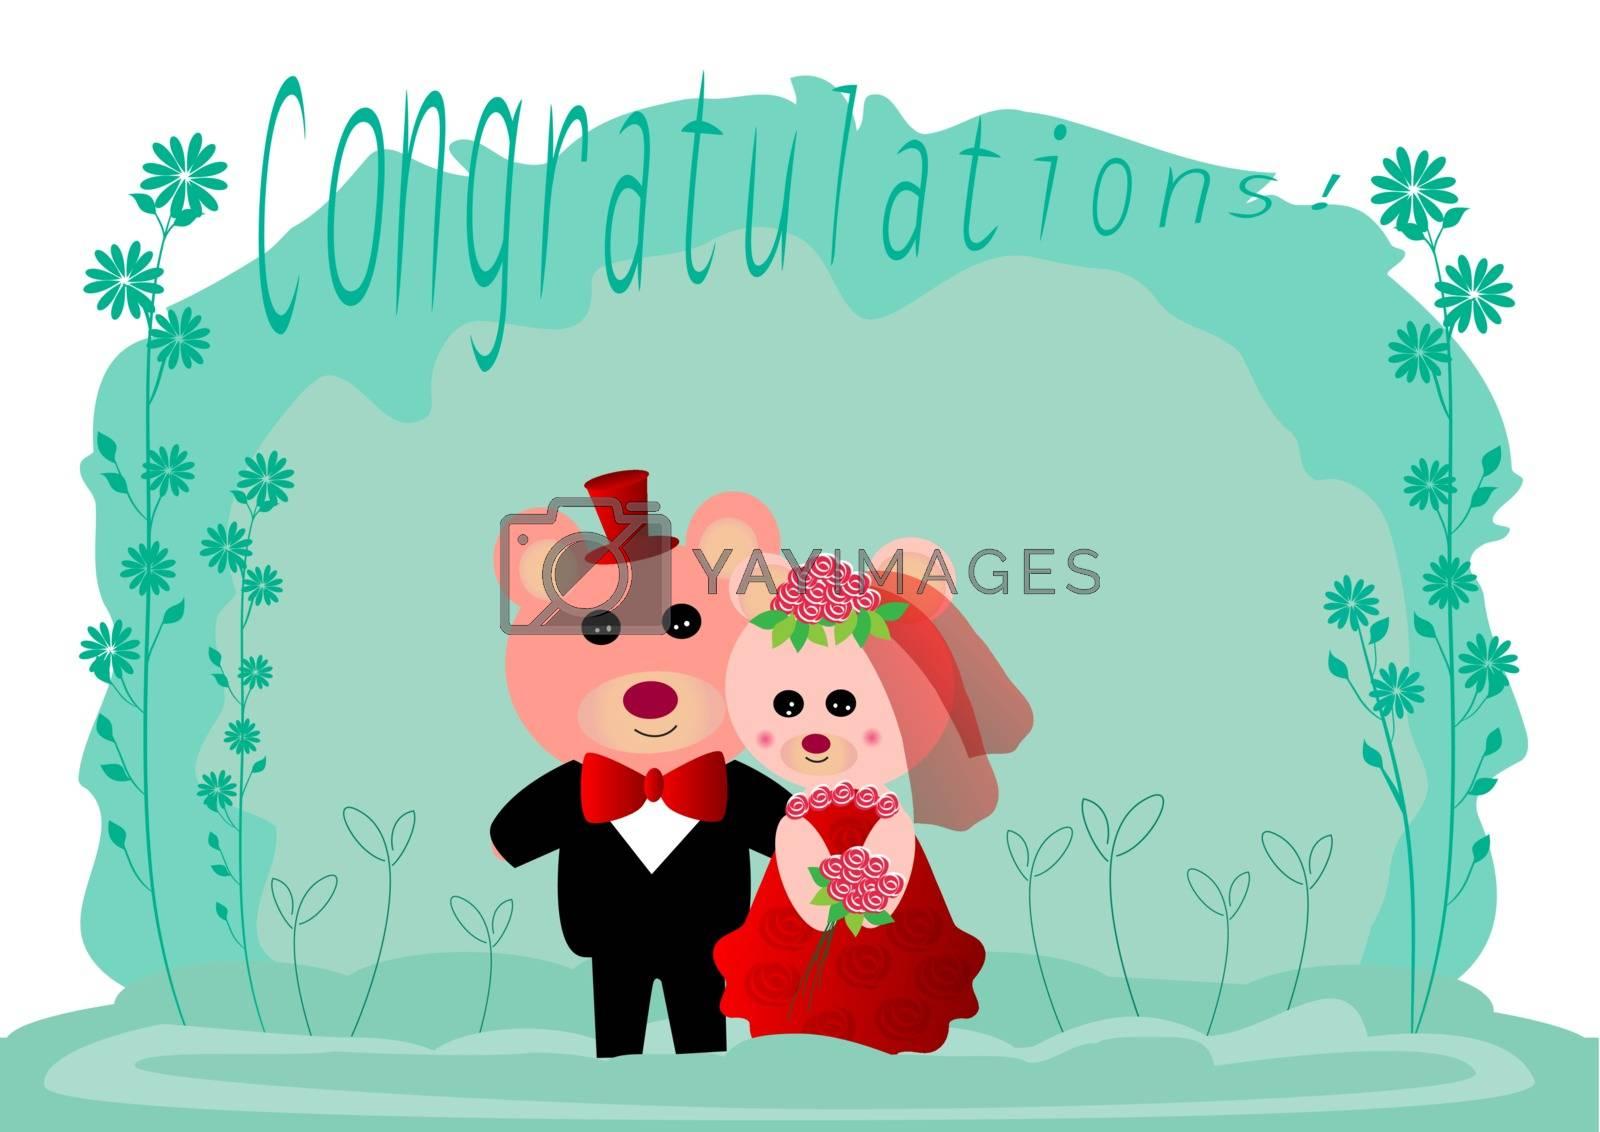 Wedding invitation card with cute teddy bears